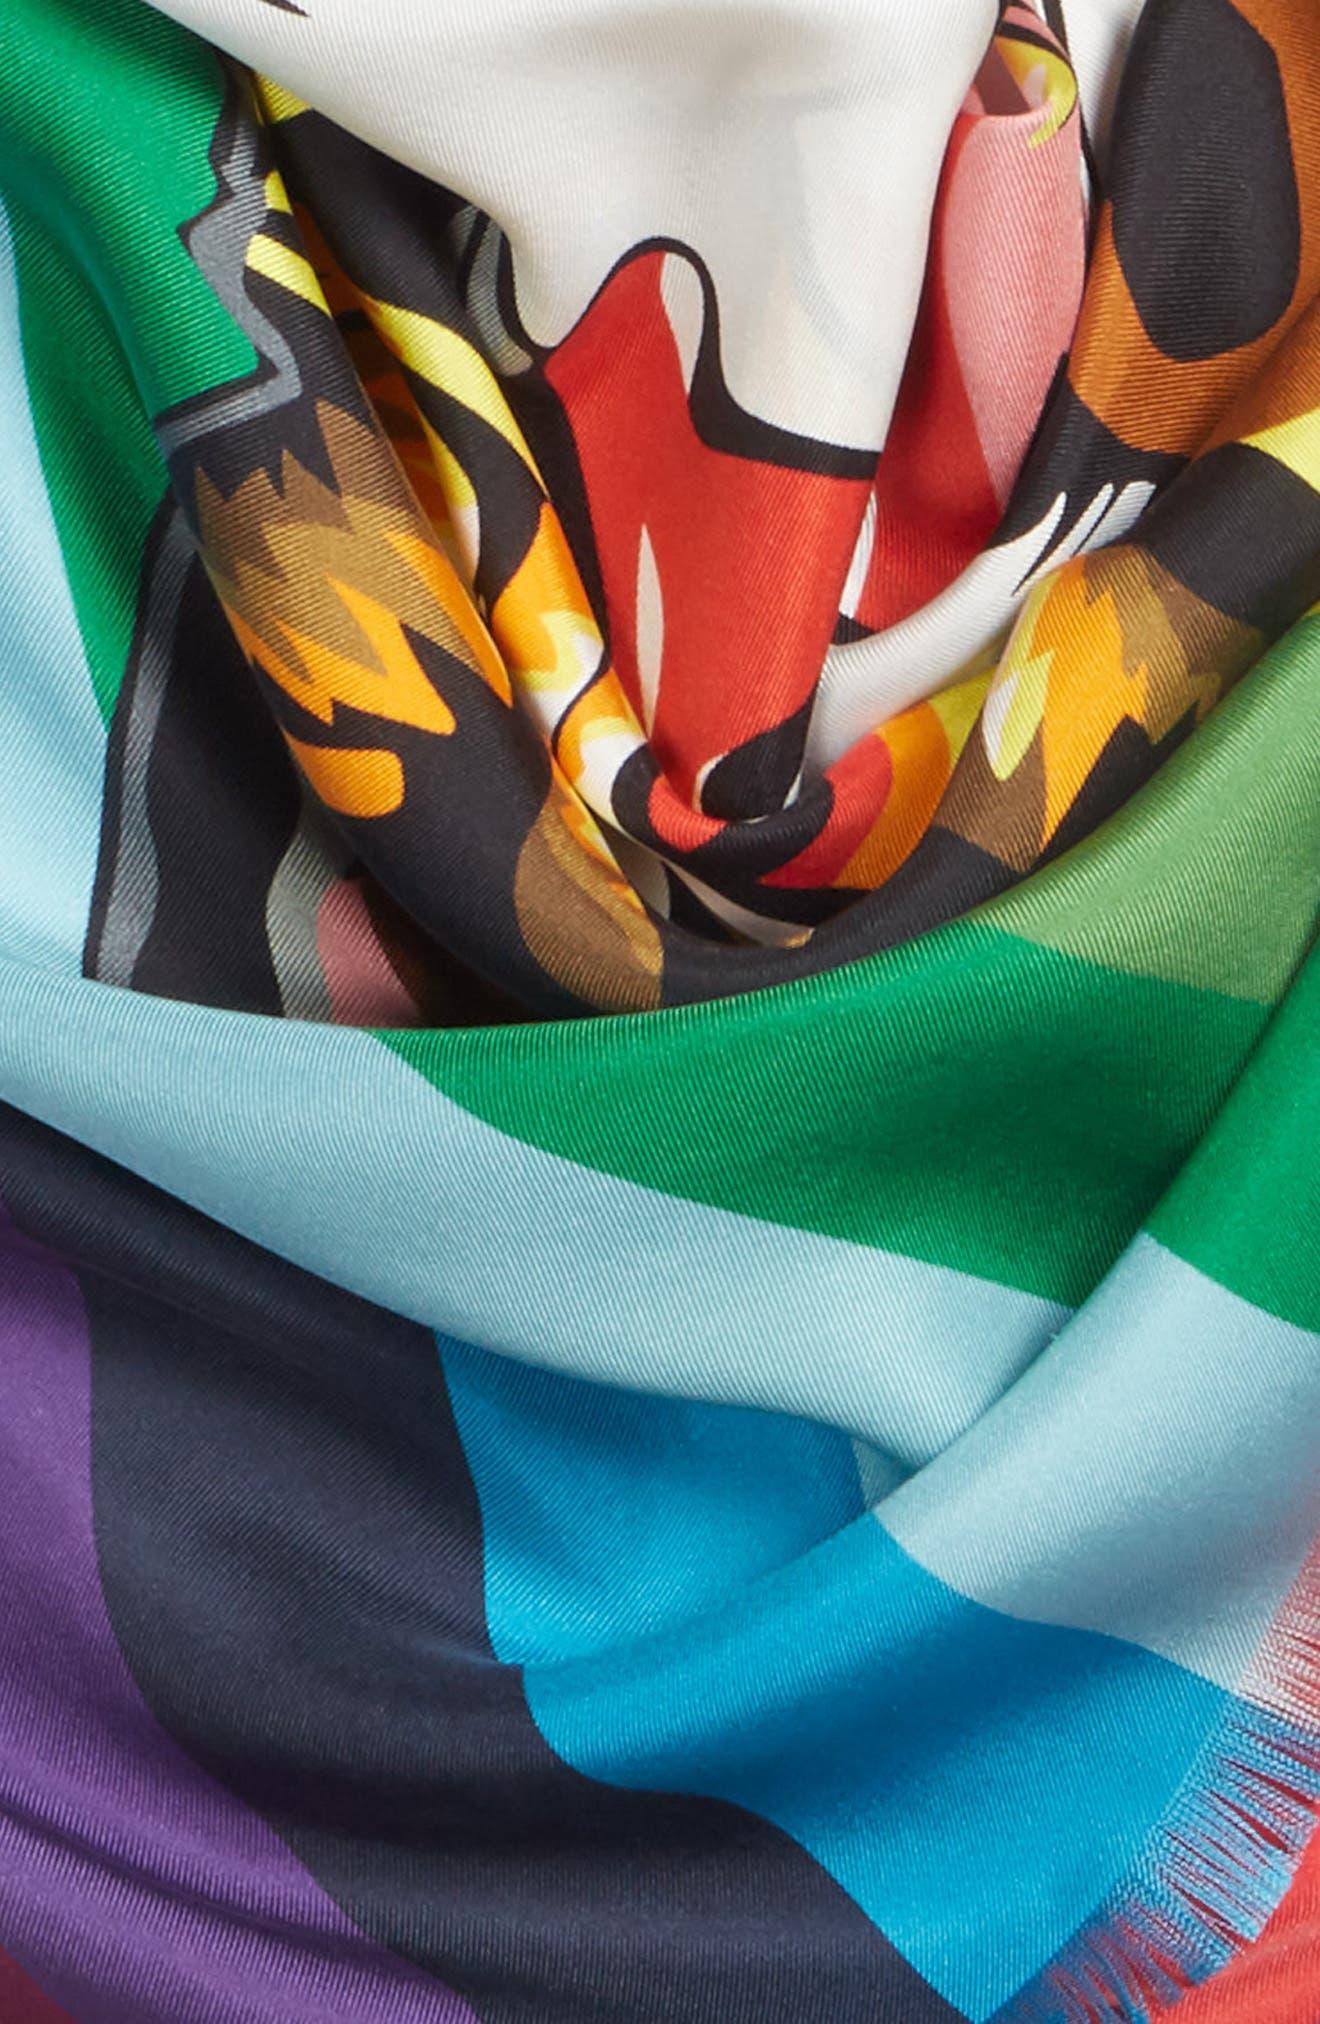 Crazy Tiger Square Silk Scarf,                             Alternate thumbnail 4, color,                             MULTICOLOR